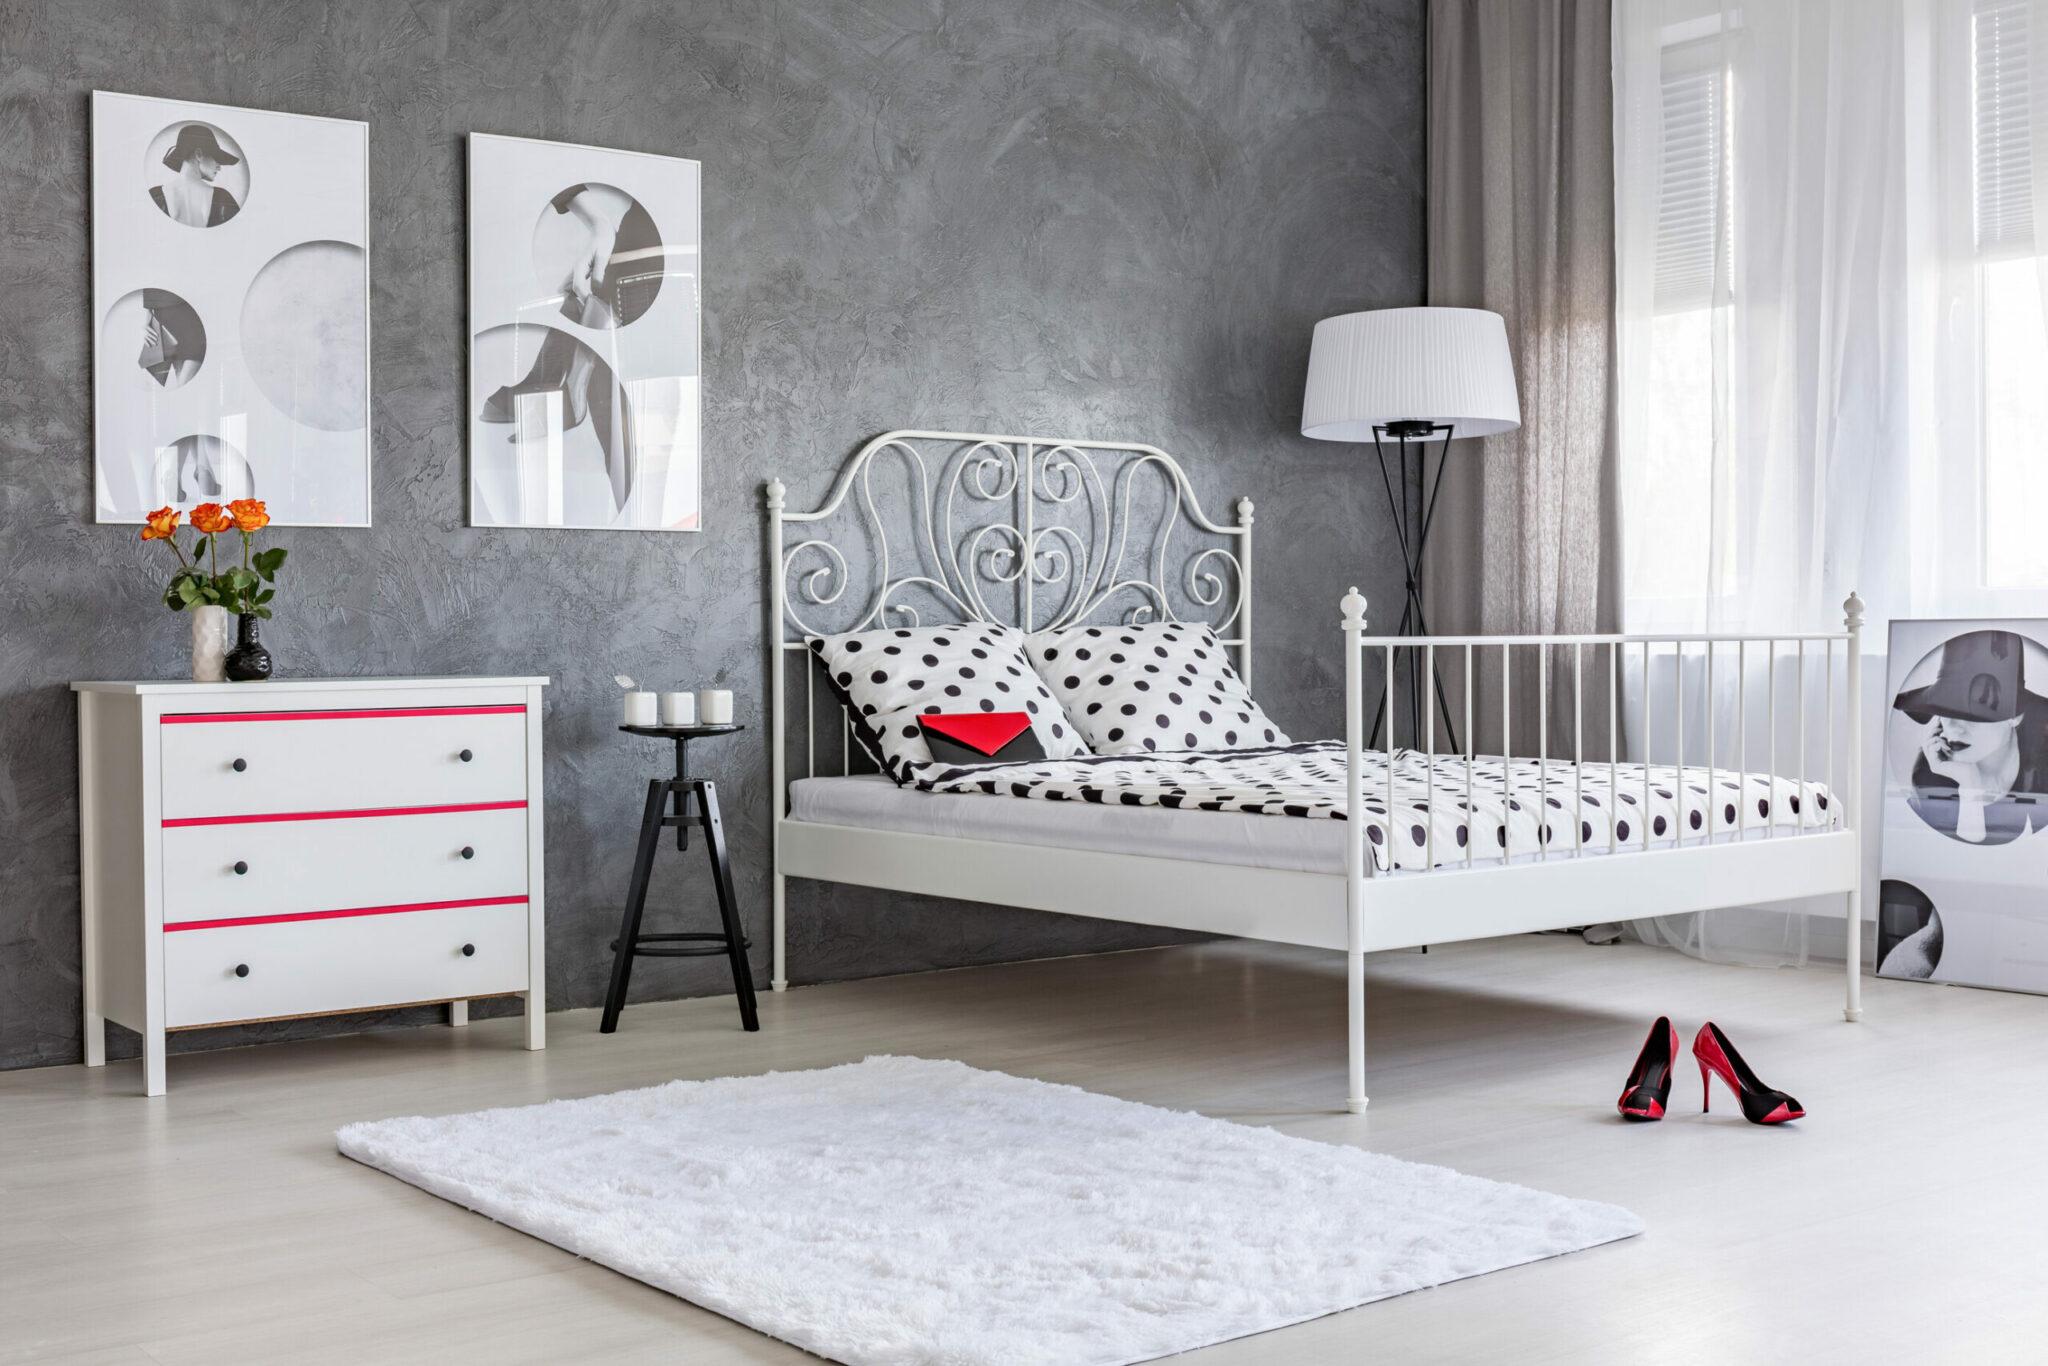 Bedroom with grey wall stucco